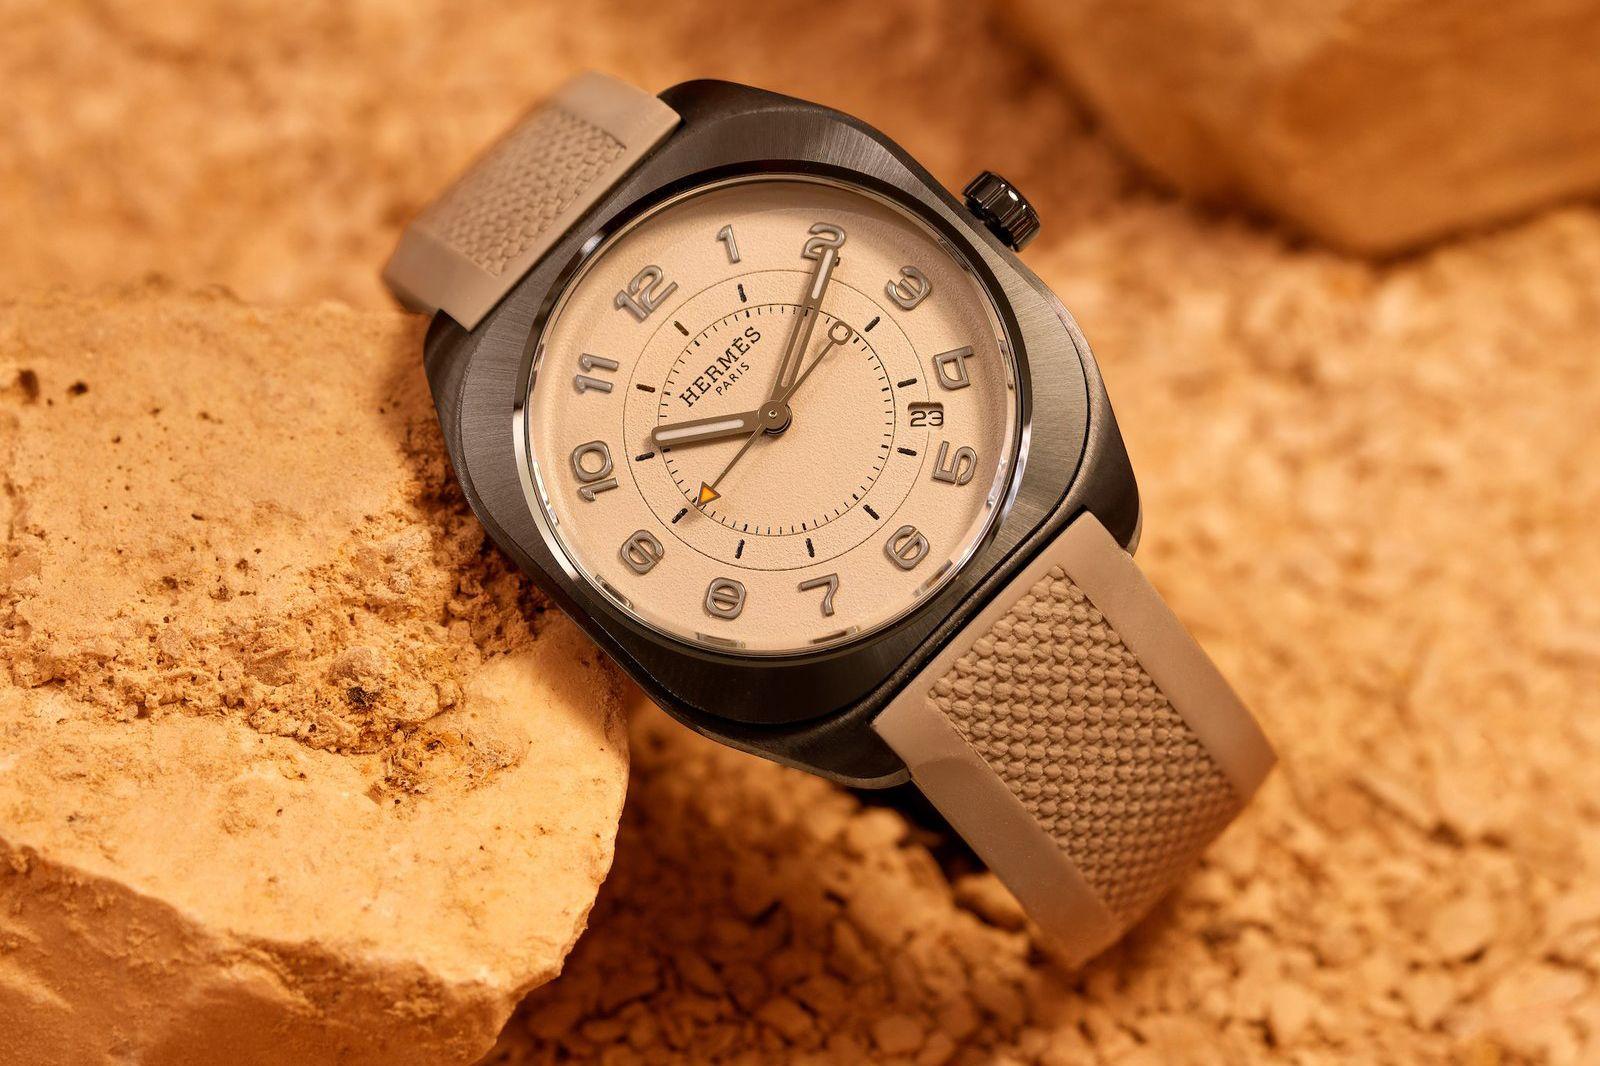 hermes-h08-hodinkee-watch (4)